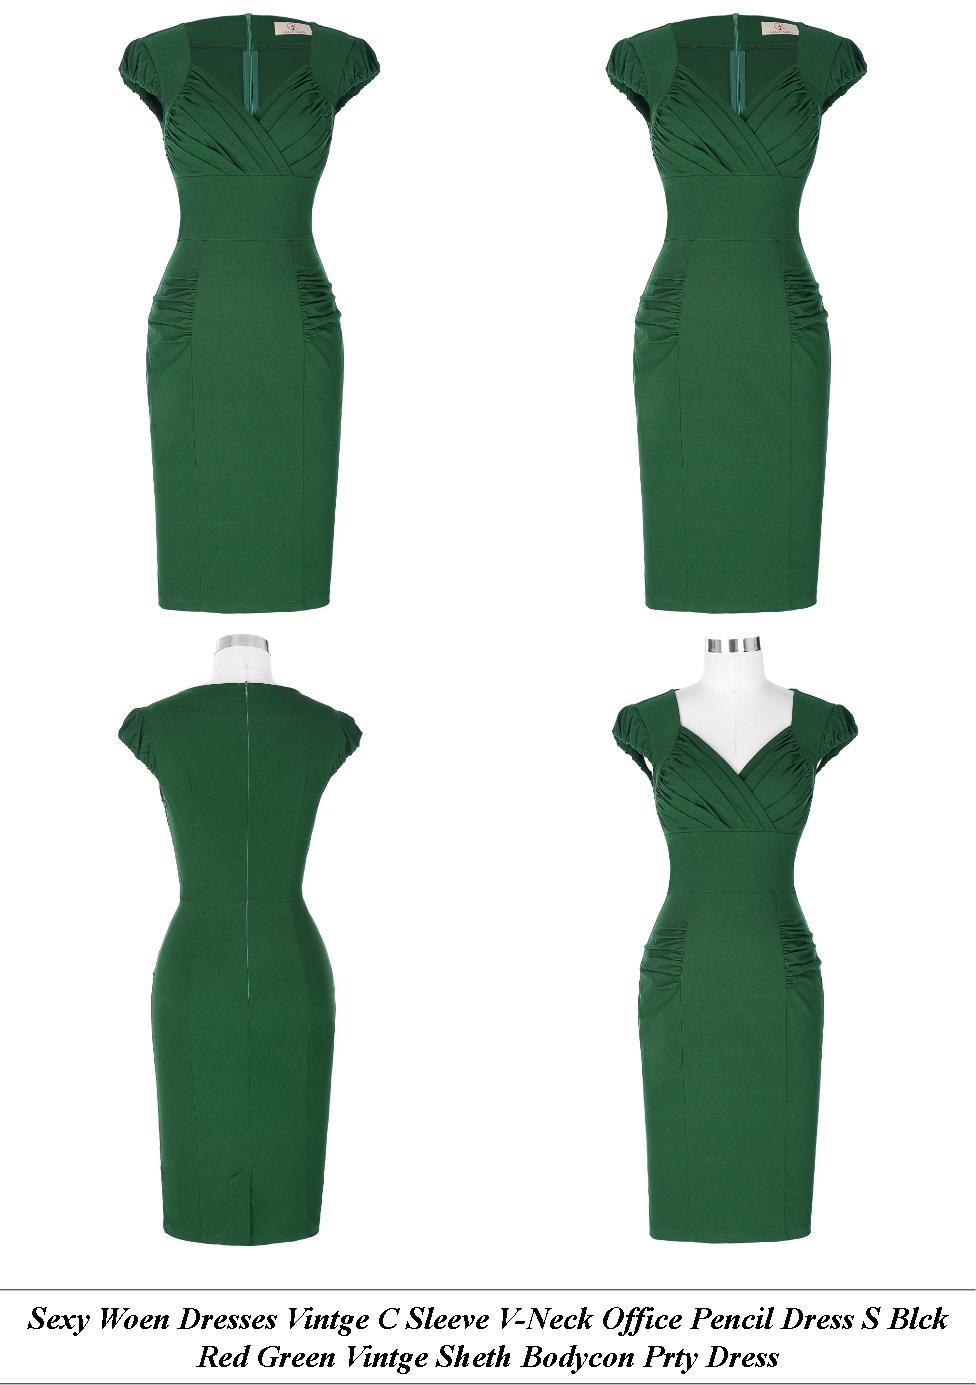 Quinceanera Dresses - Shop For Sale In London - Little Black Dress - Cheap Branded Clothes